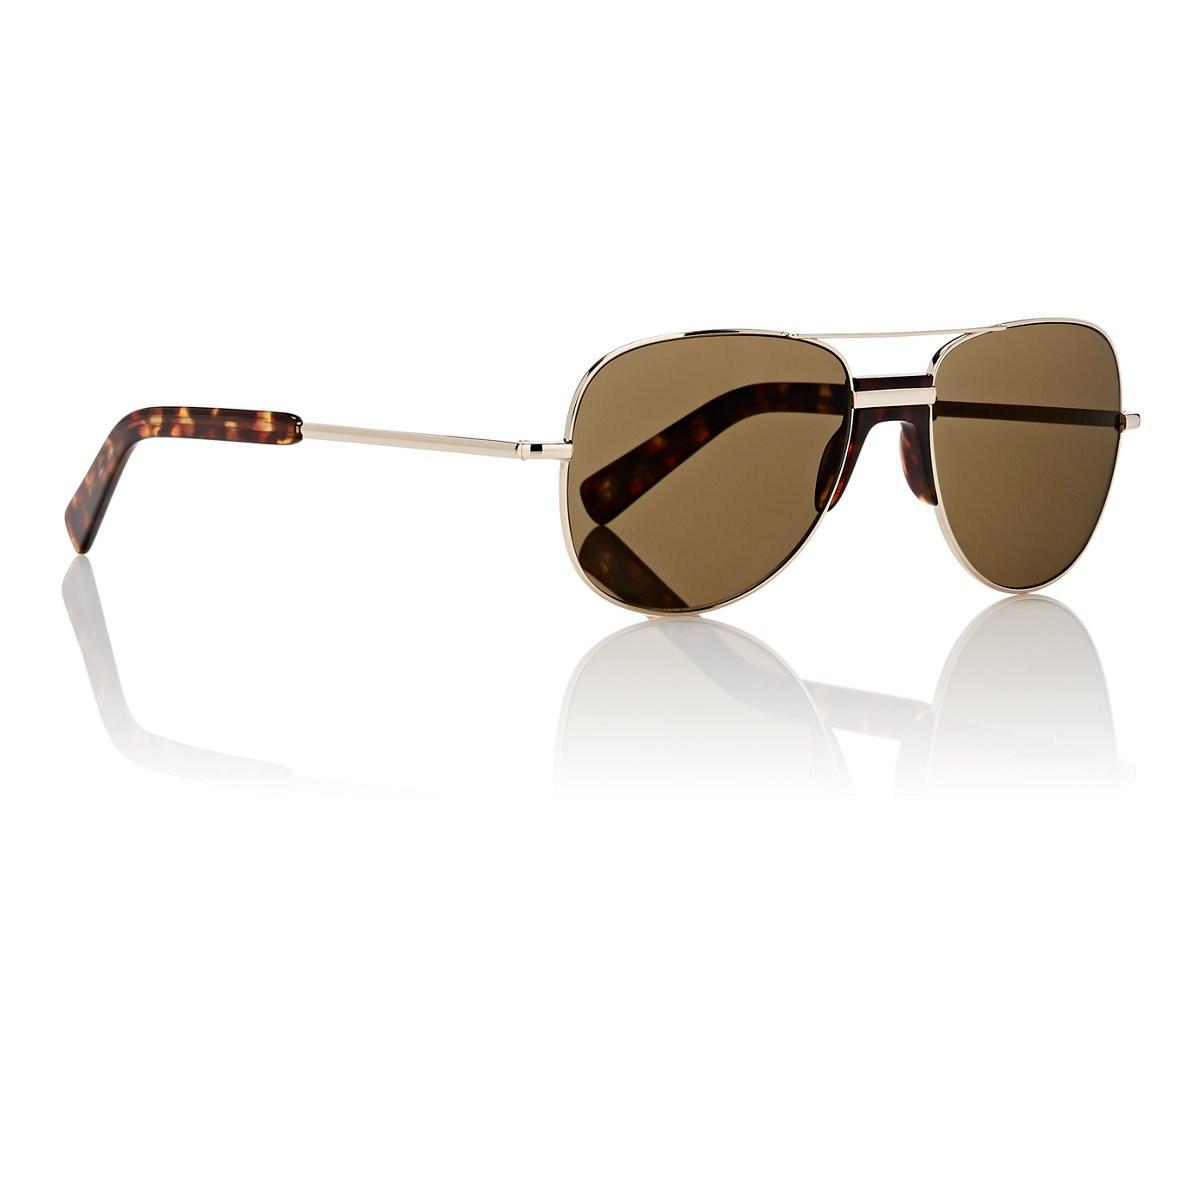 48b061a74edb Moscot - Metallic Bulvan Sunglasses for Men - Lyst. View fullscreen